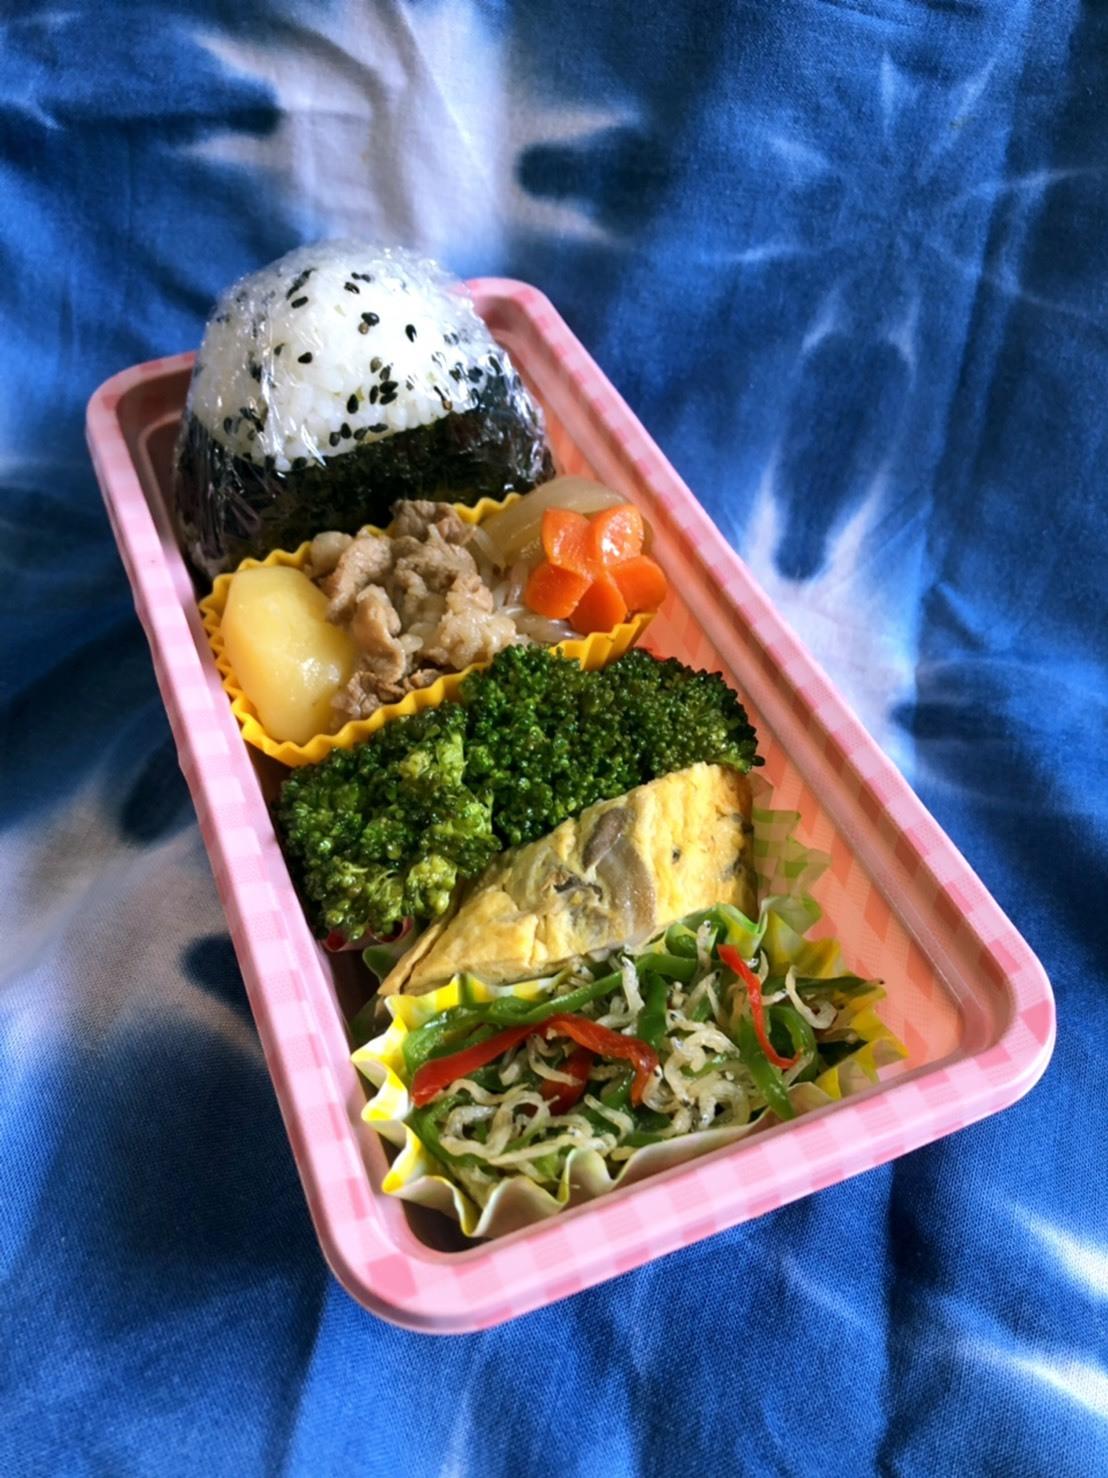 Saturday Lunch Boxes & インスタ_b0376788_12262283.jpg